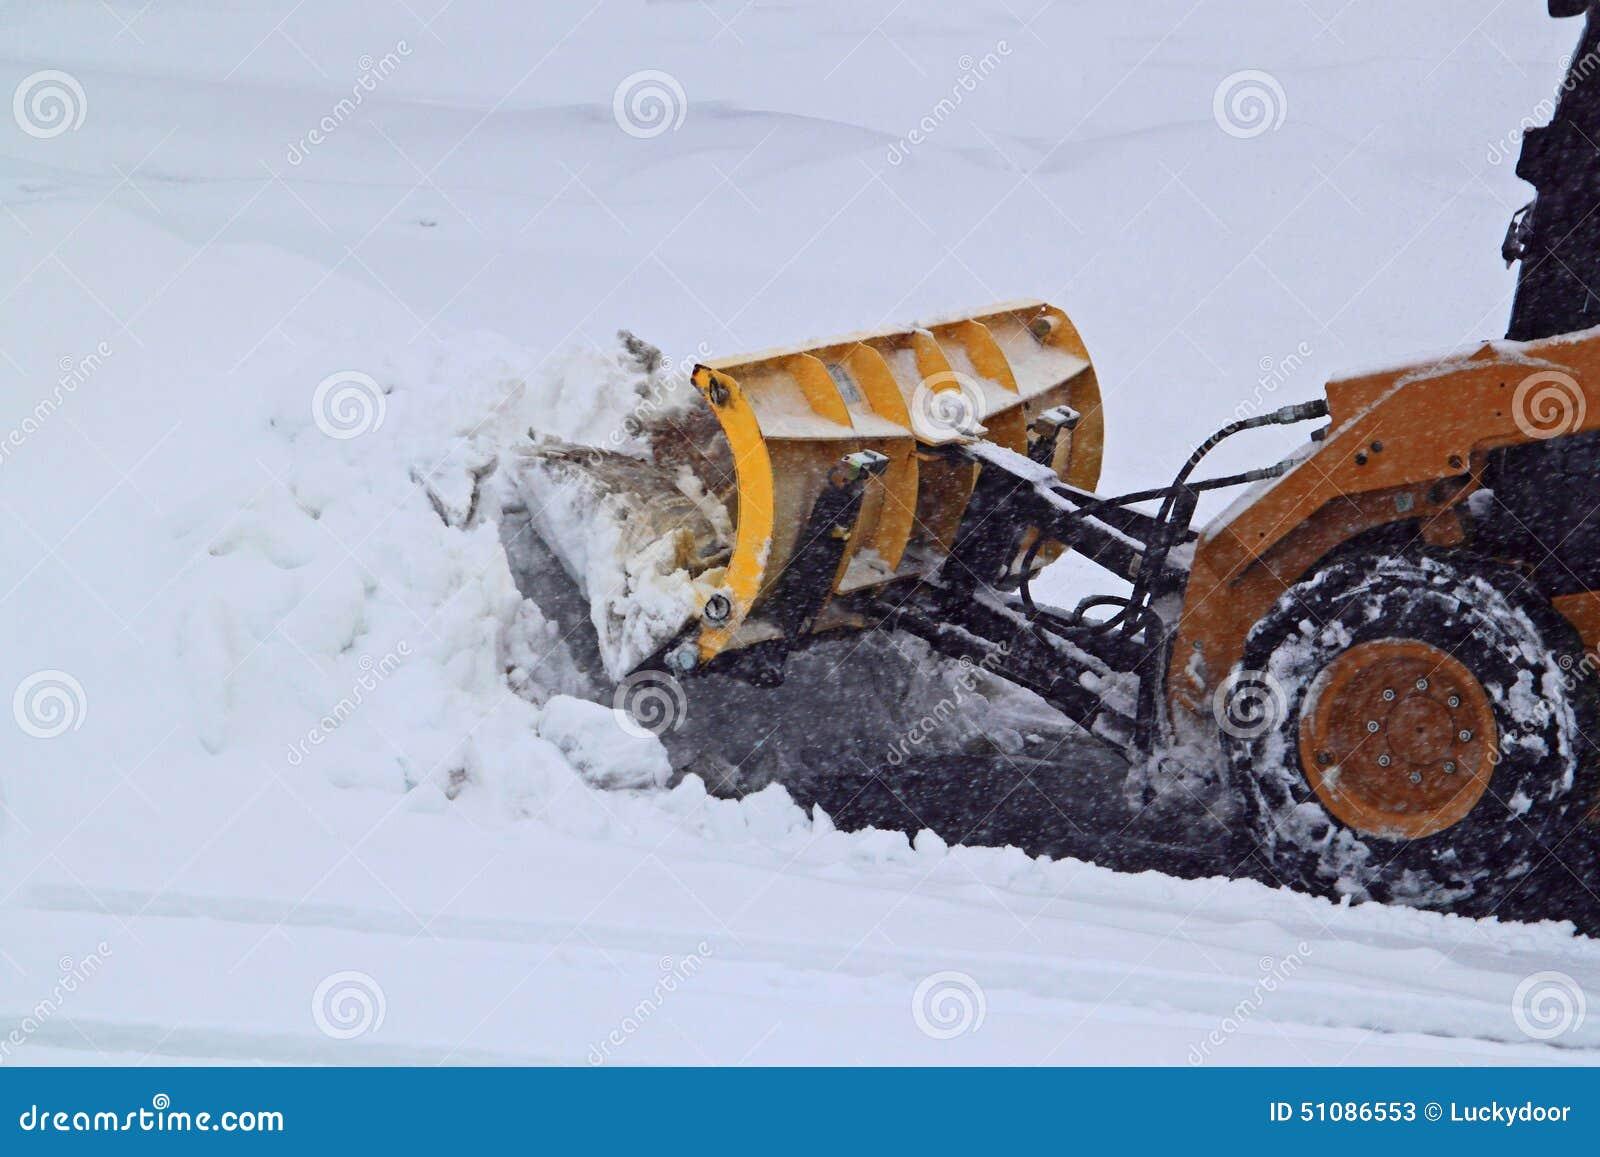 Ploegende Sneeuwweg